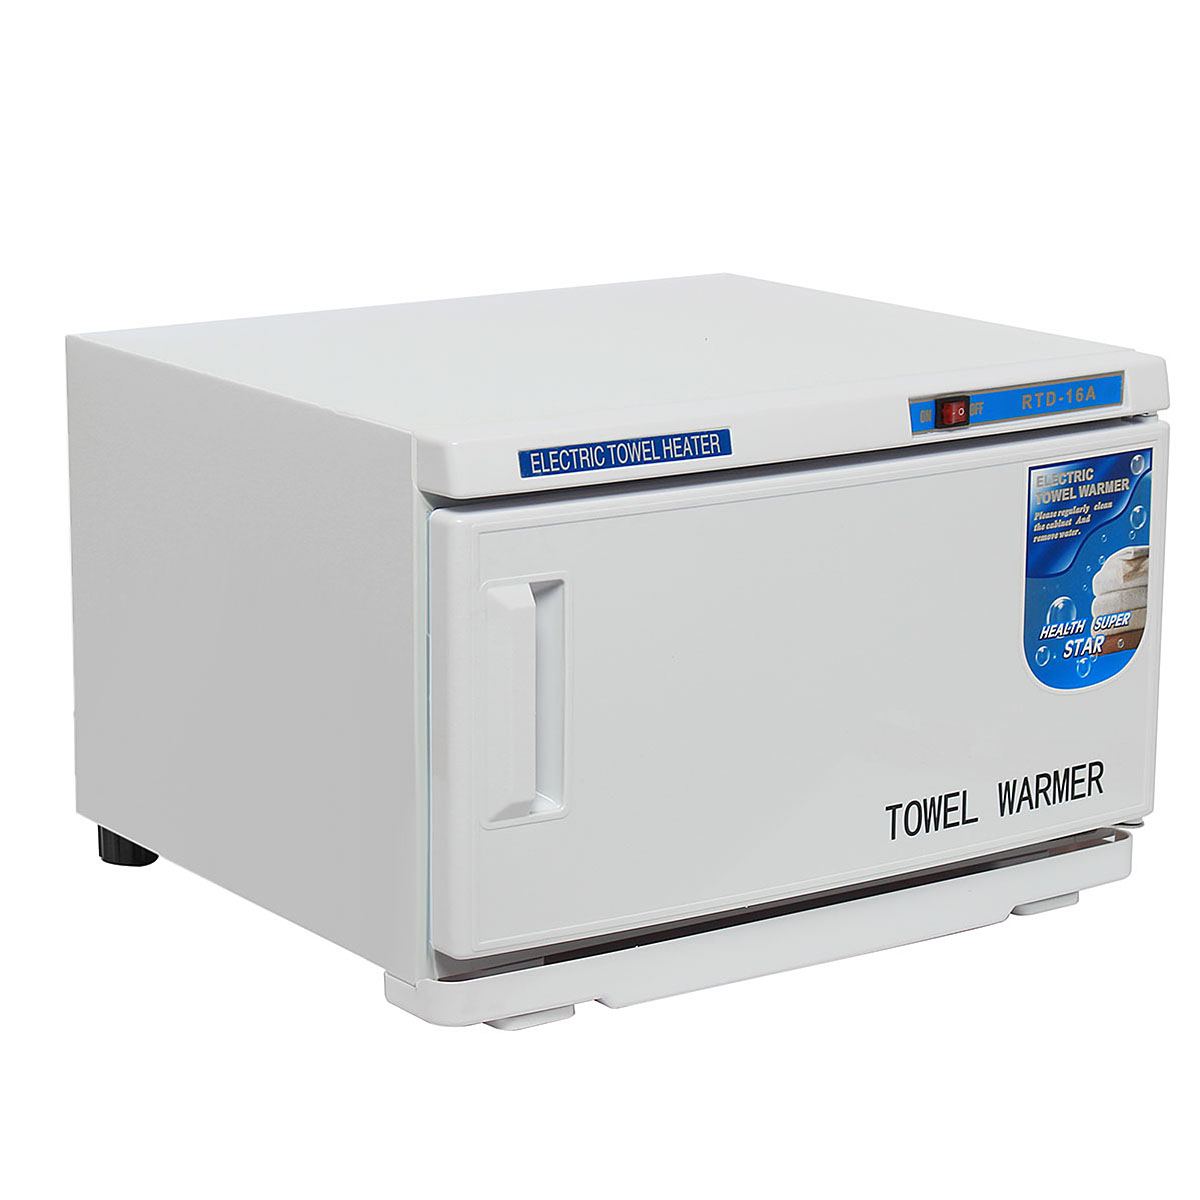 UV Light Hot Sterilizer Disinfection Towel Warmer 16L 200W 110V Cabinet Sterilization Stainless Steel Nail Beauty Art Equipment